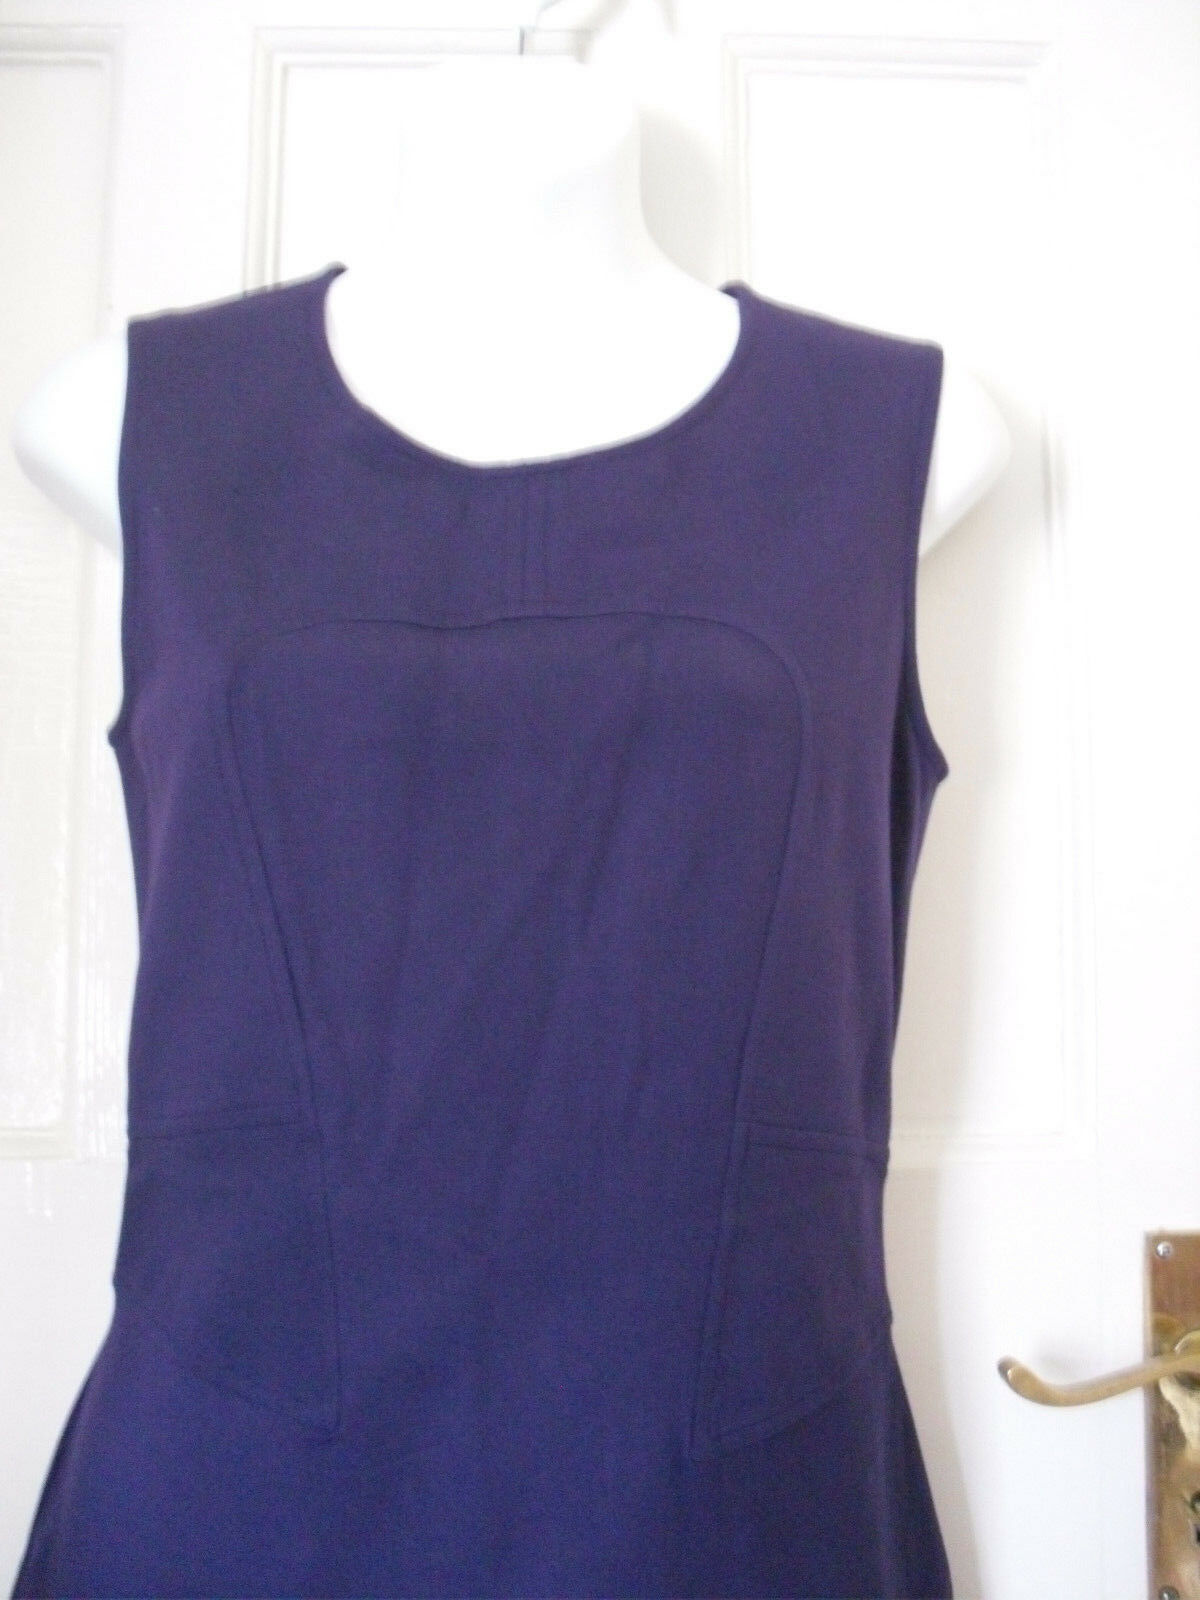 VERSACE Jeans Couture Da Da Da Donna Viola Abito senza maniche taglia 28 42 UK-8-10 (WD24) 79292f